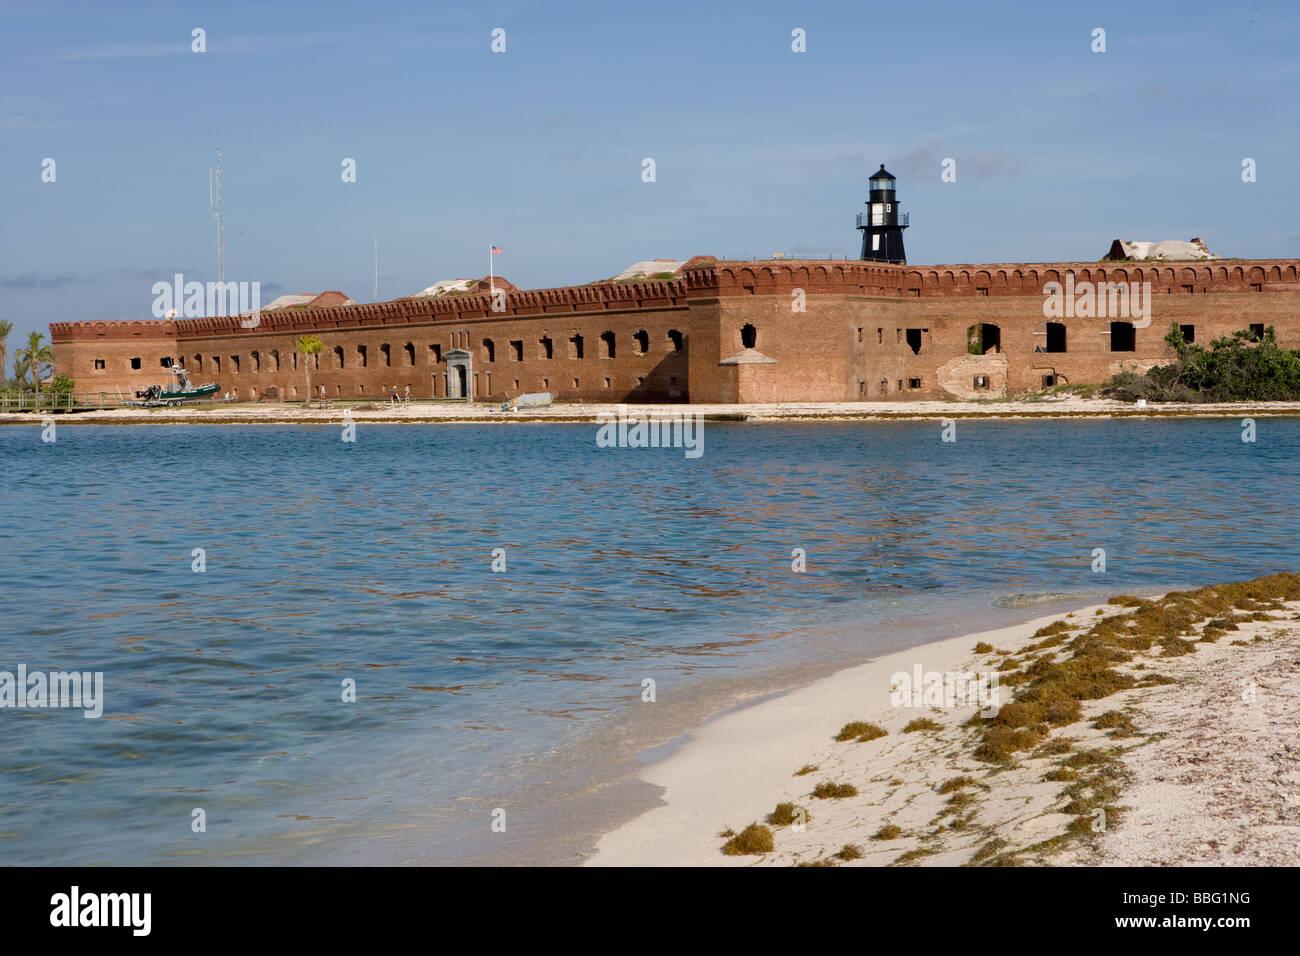 Ft. Jefferson, brick structure. - Stock Image